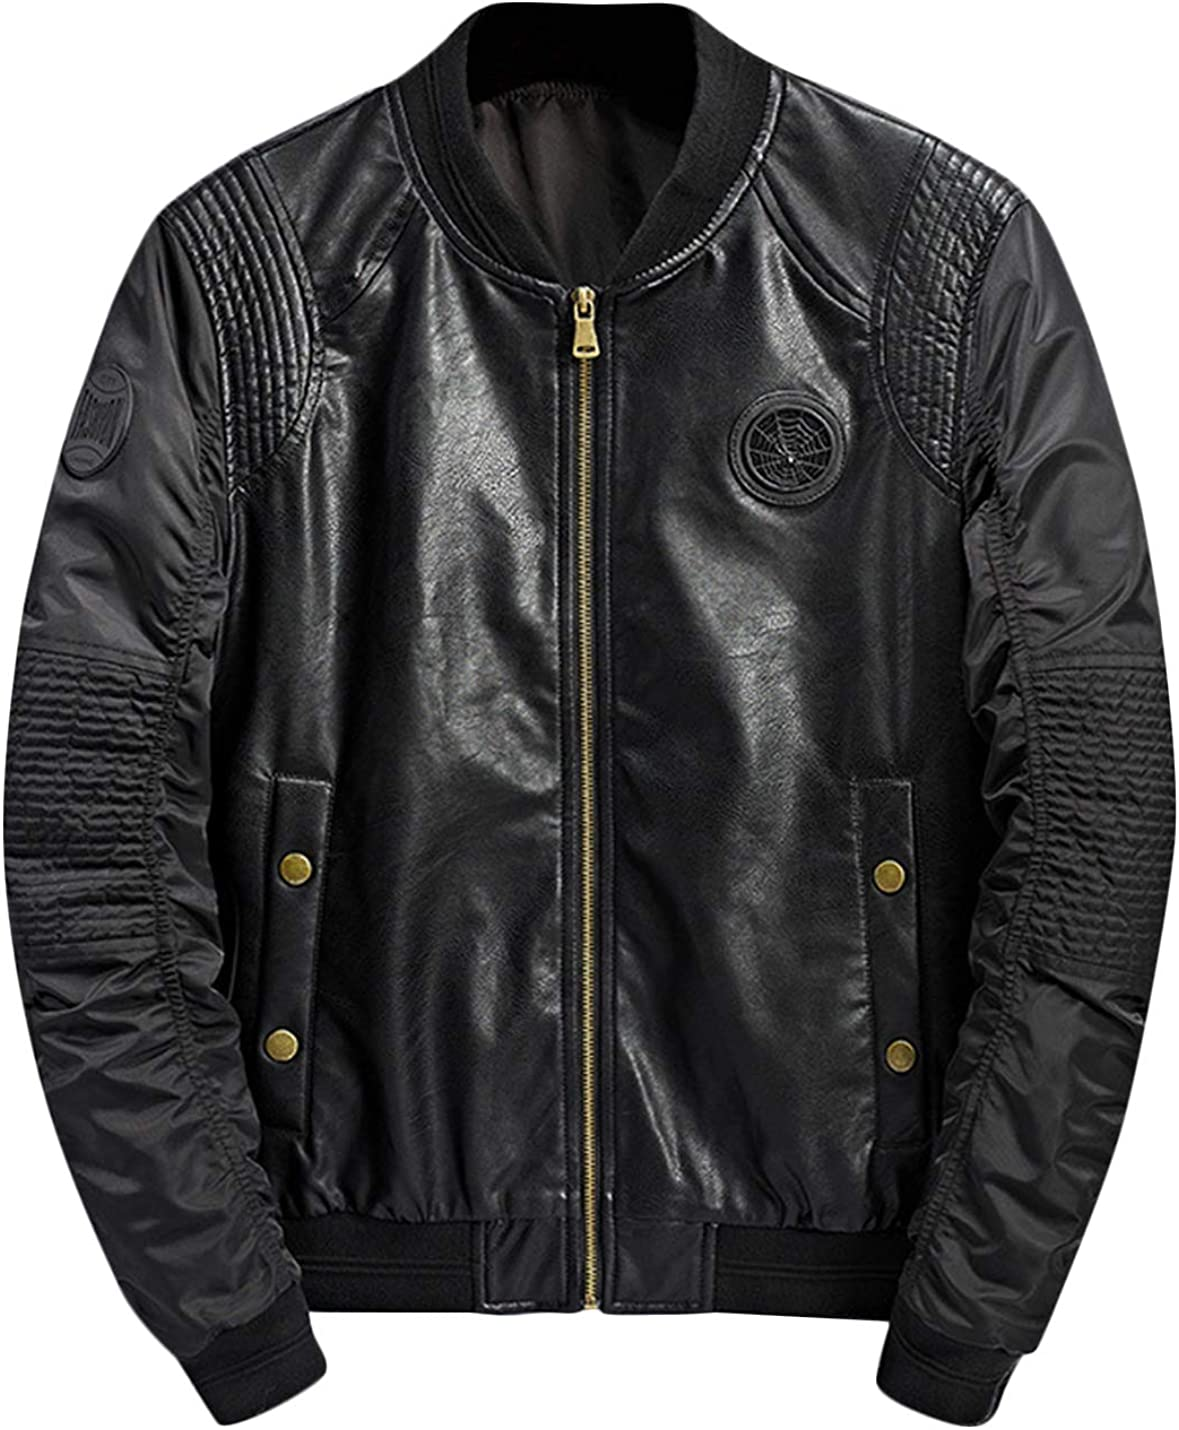 Springrain Men's Stand Collar Zip Up Faux Leather Moto Biker Bomber Jacket